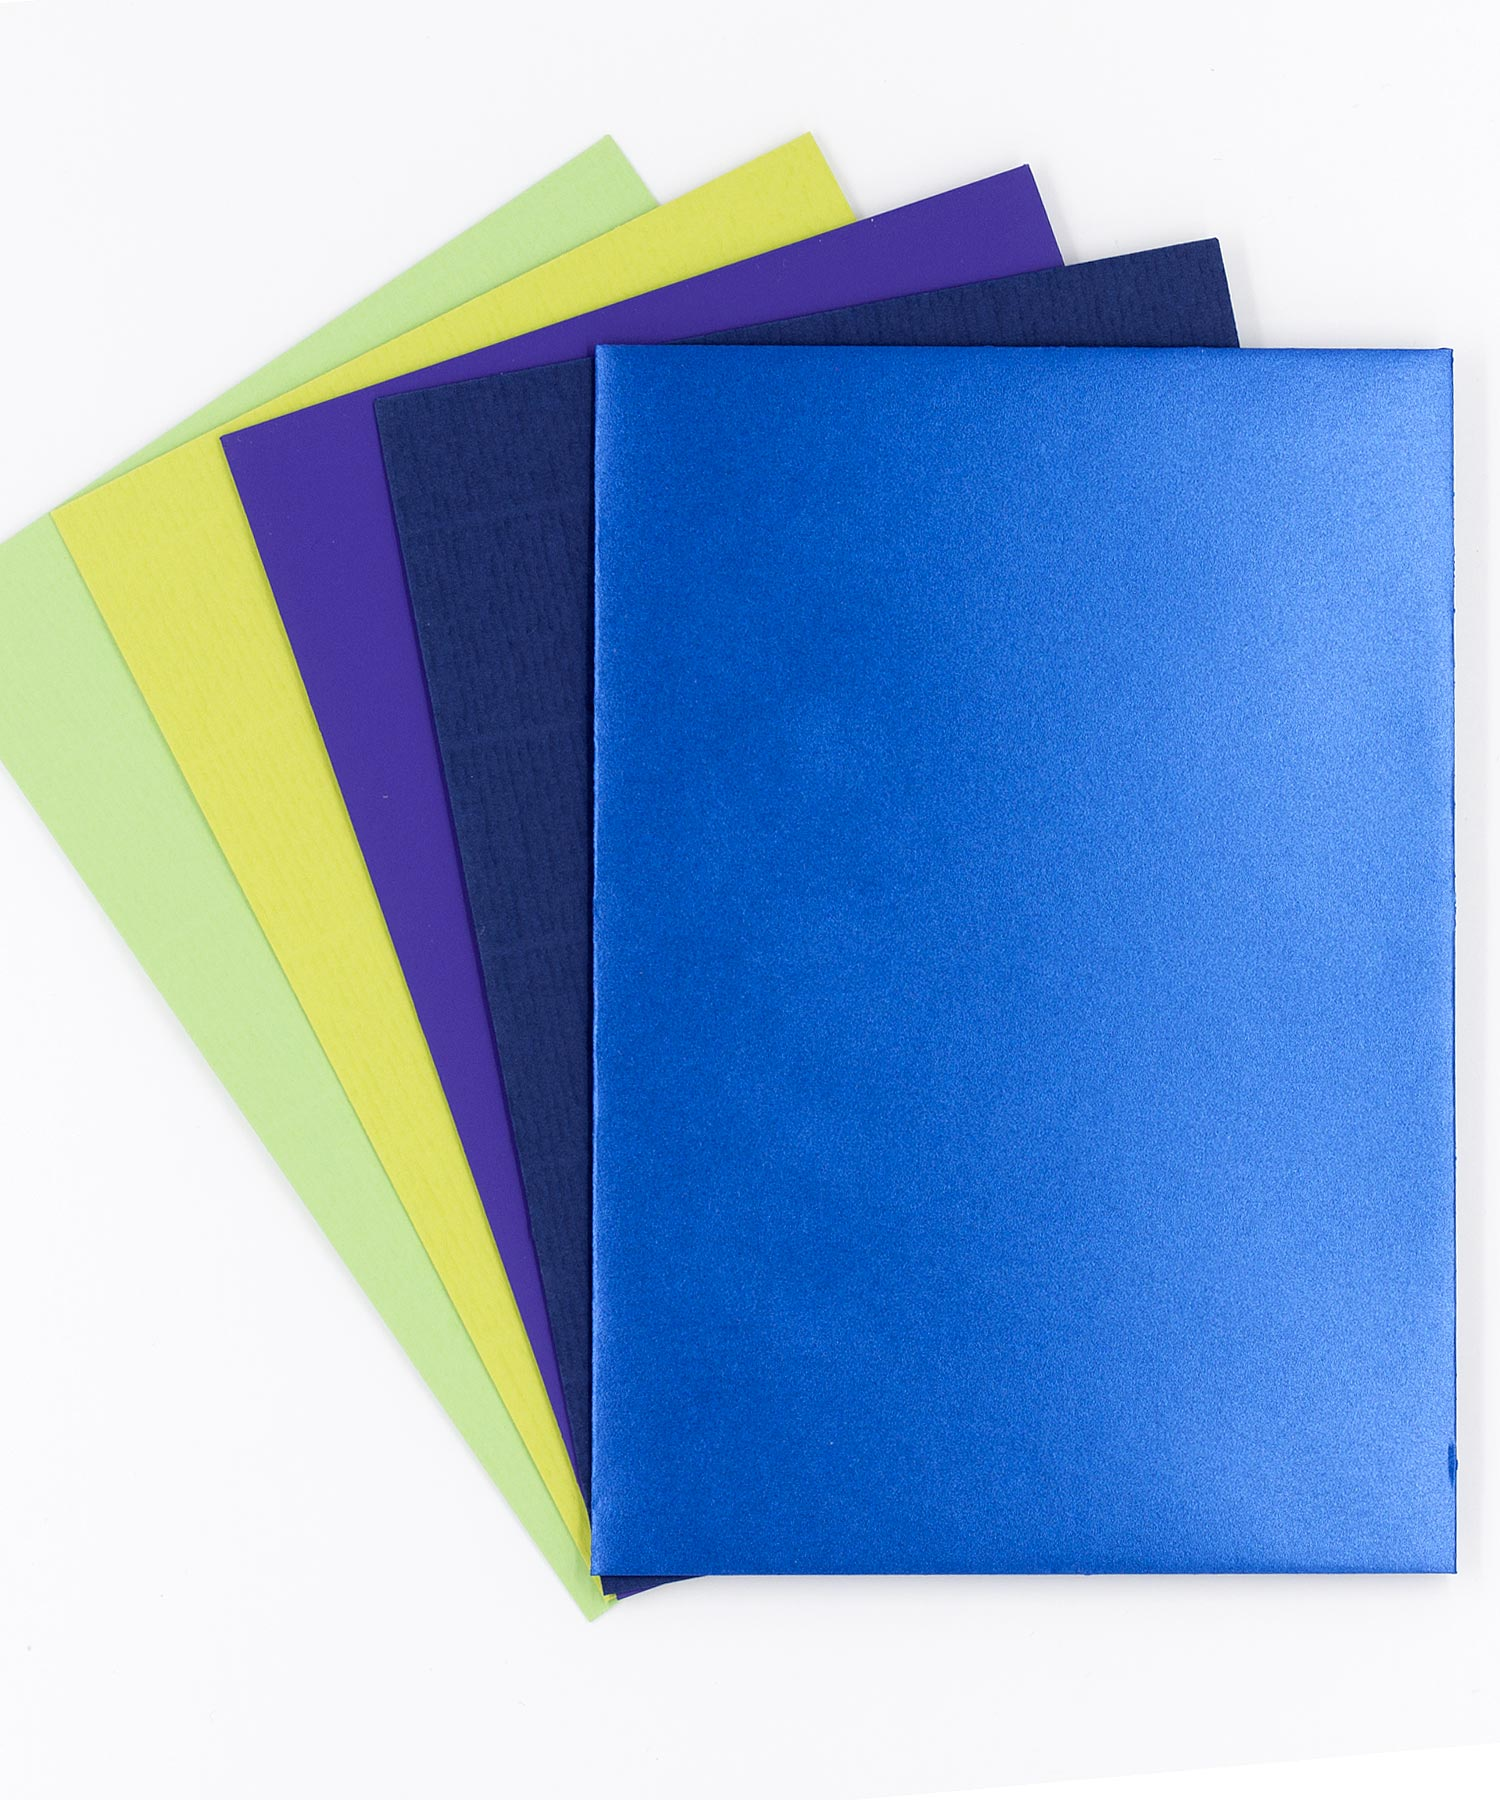 Kuverts grün-blau